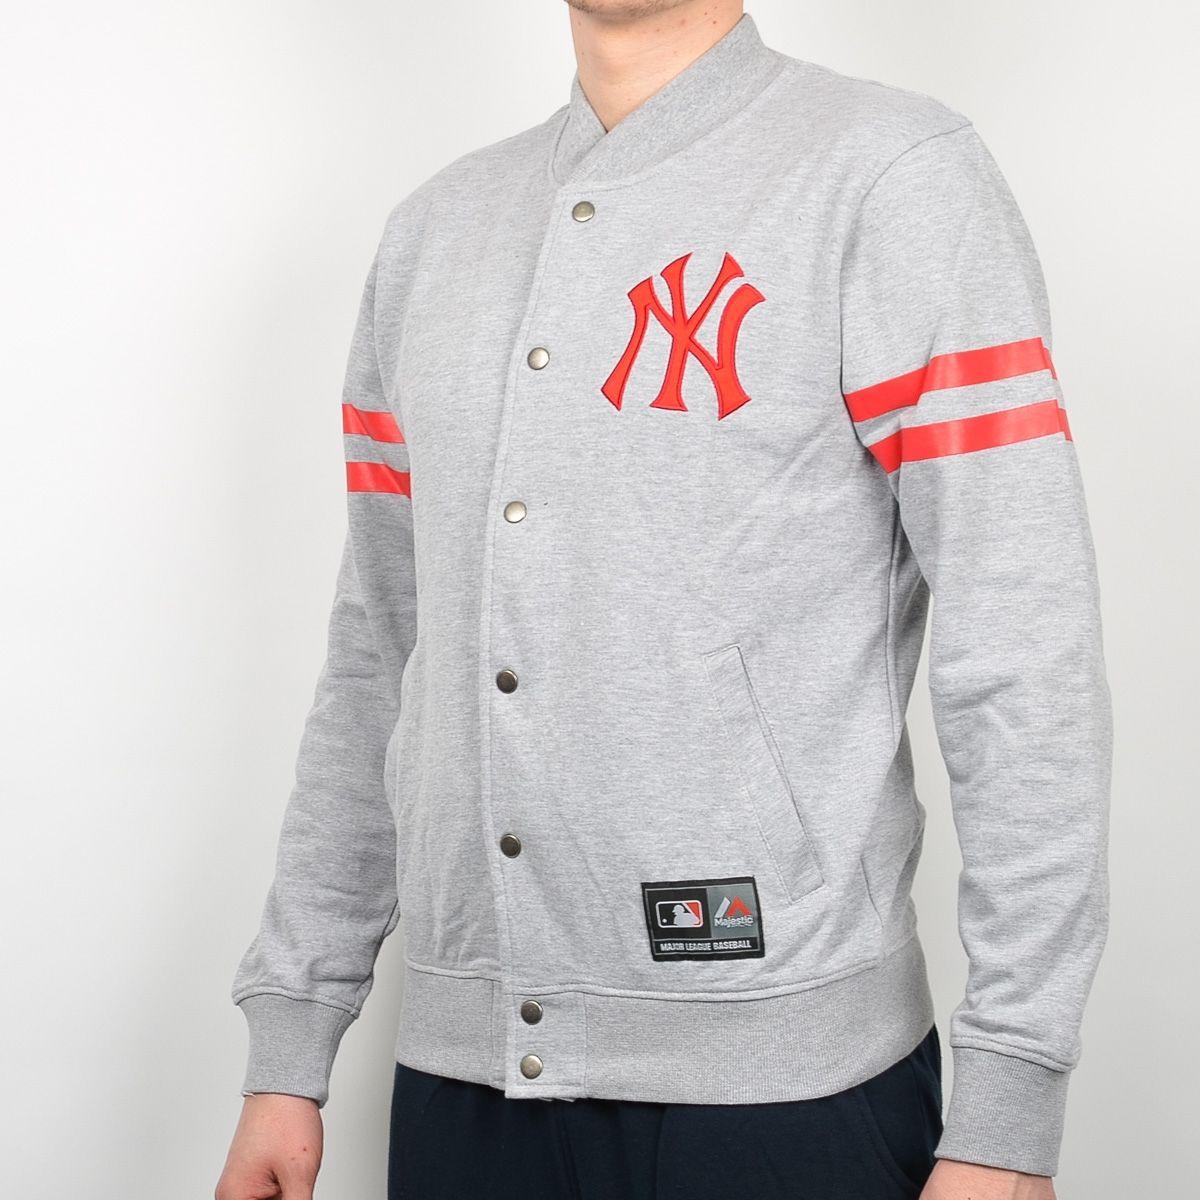 brand new 9f9d5 97ea6 Type Hoodies Majestic MLB New York Yankees Roper Fleece Letterman Jacket